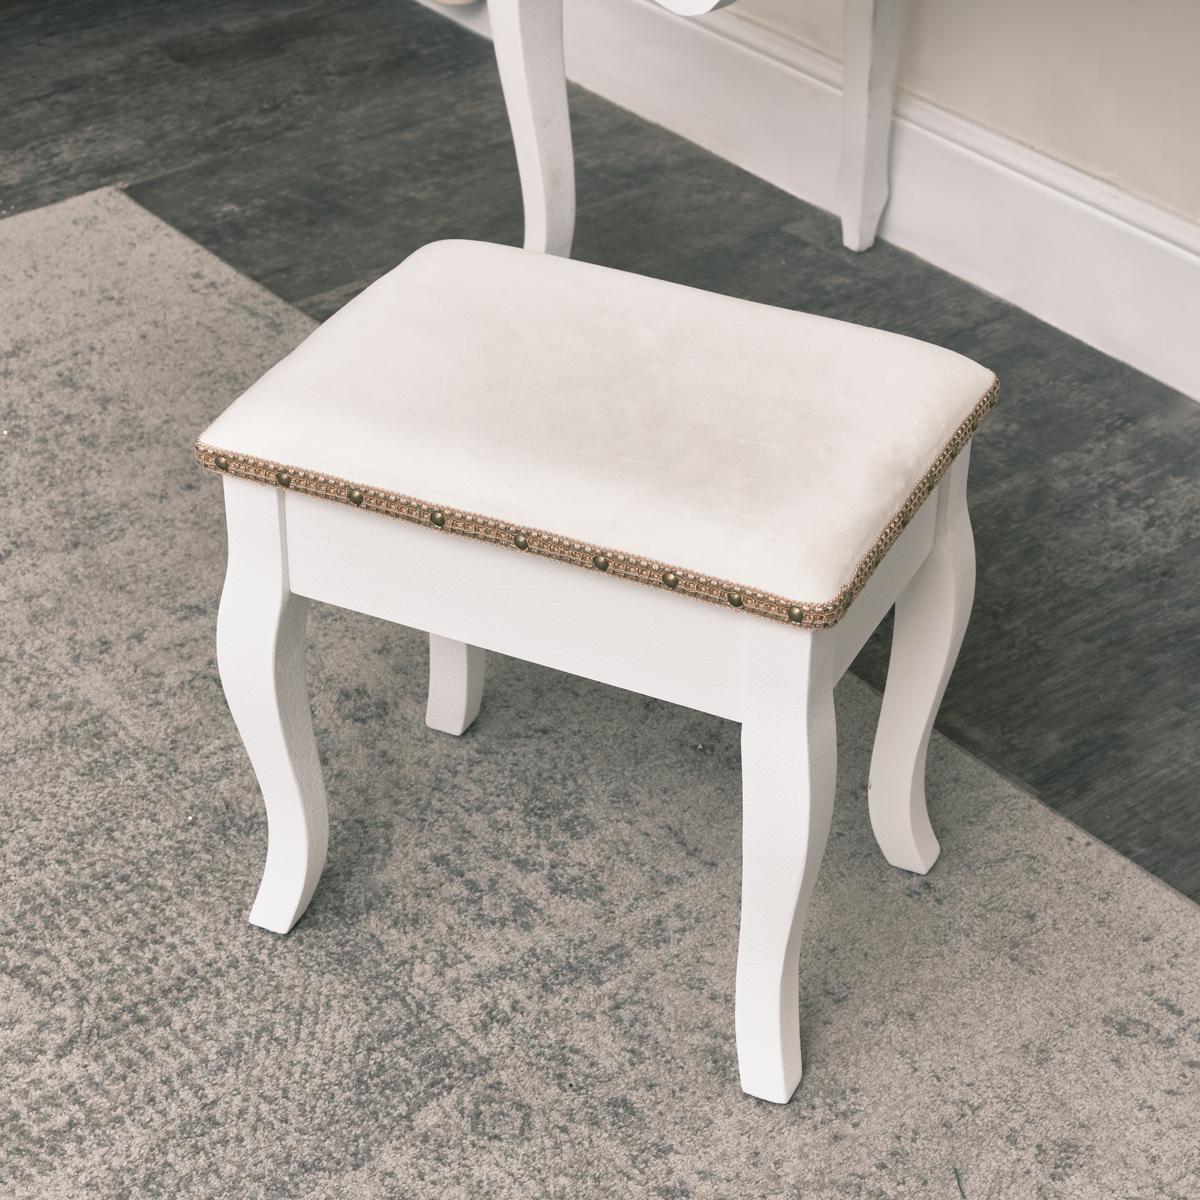 Antique White Padded Dressing Table Stool - Pays Blanc Range